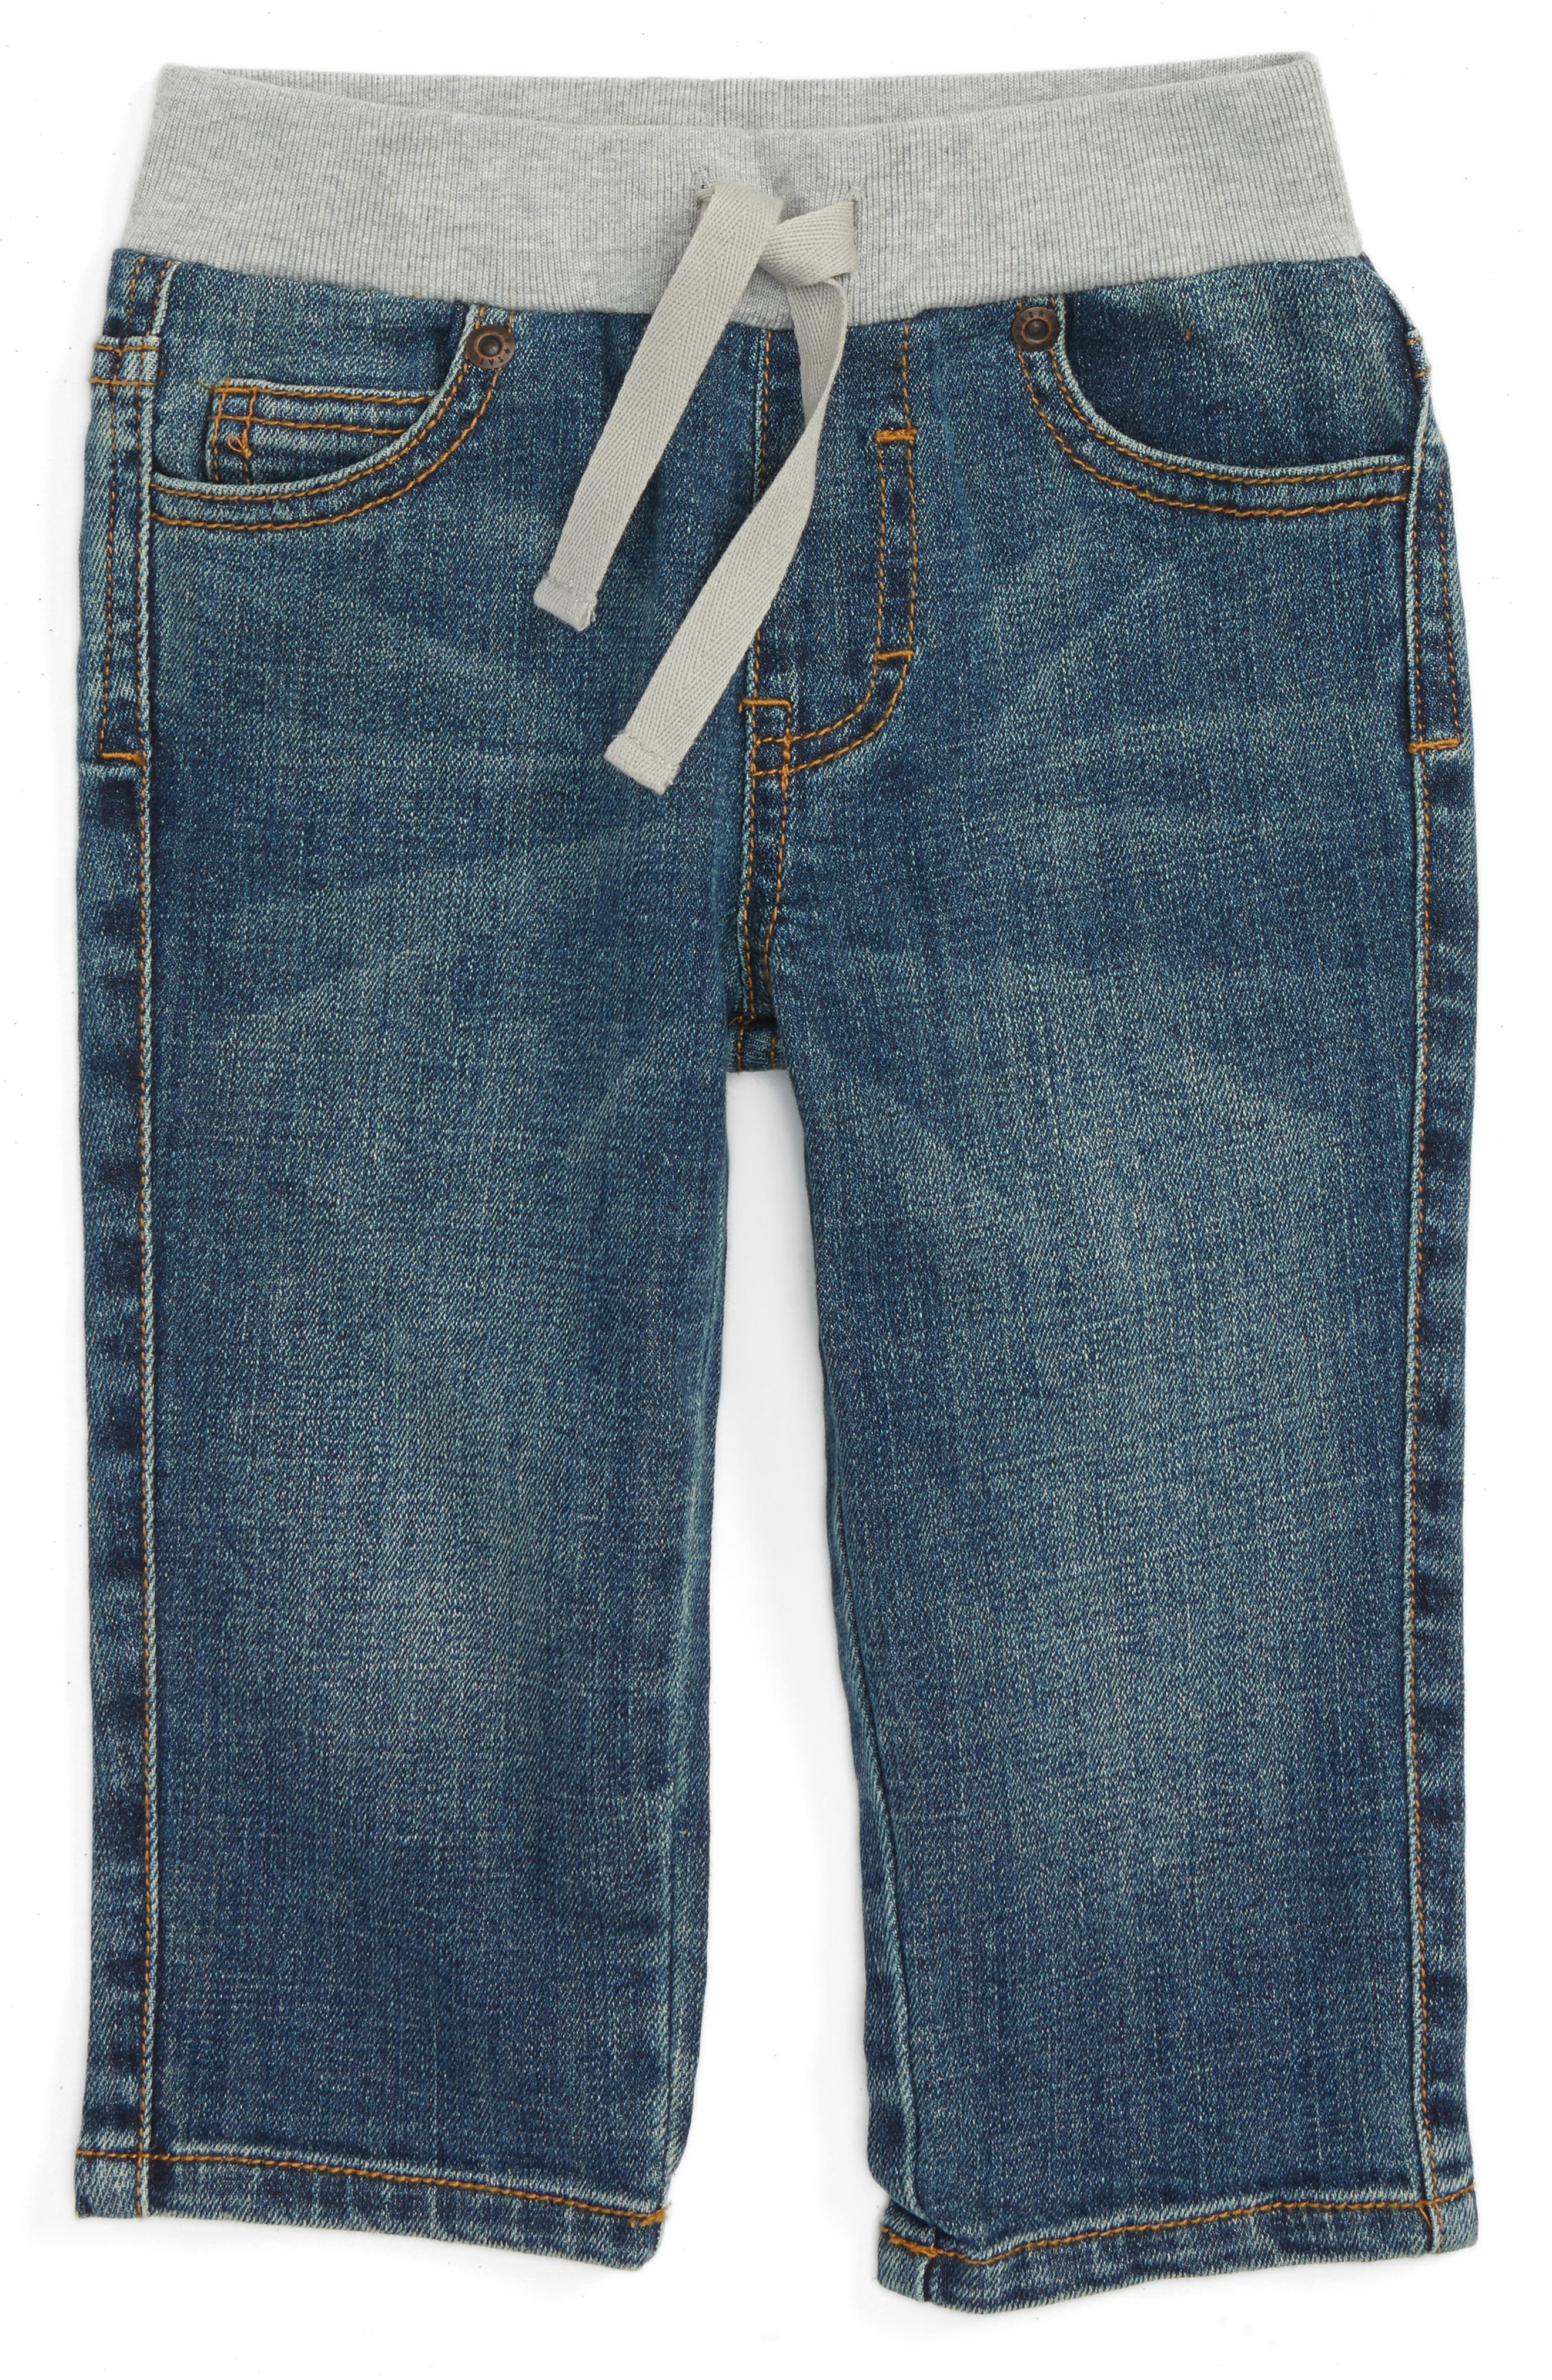 Alternate Image 1 Selected - Tucker + Tate Tucker Jeans (Baby)